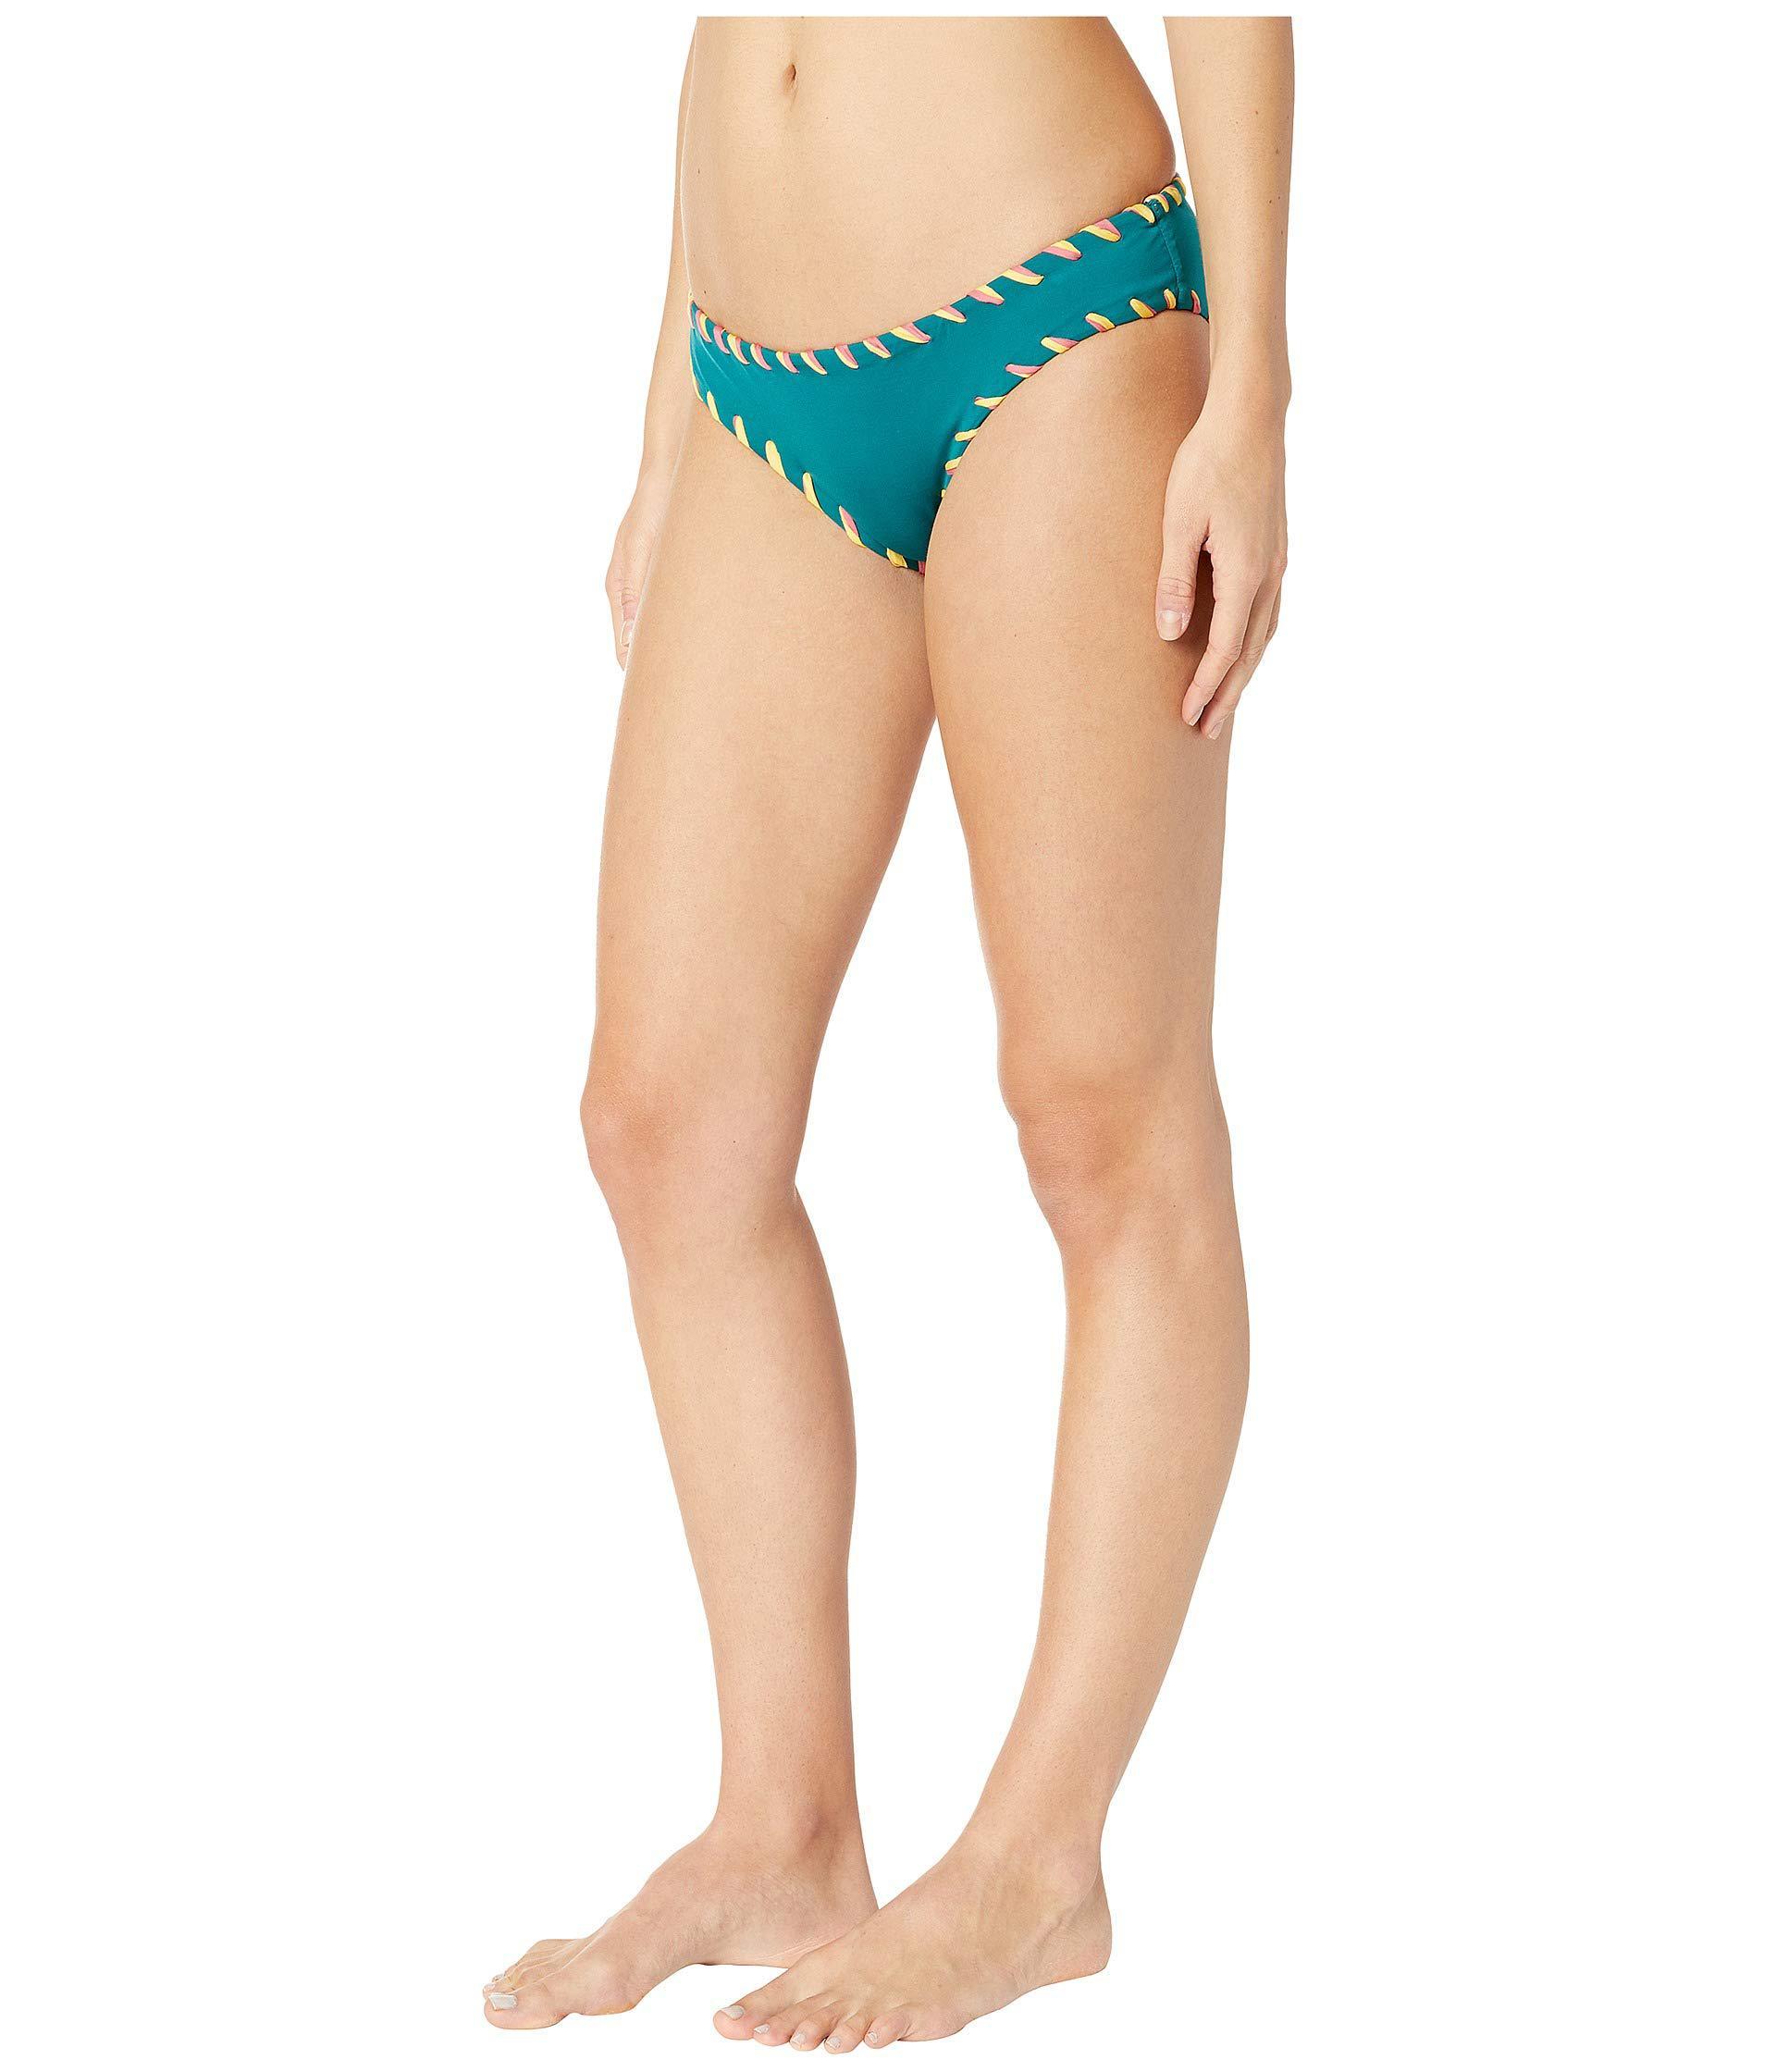 f7a2c604f5d93 Lyst - Becca Camille Reverse American (fern) Women's Swimwear